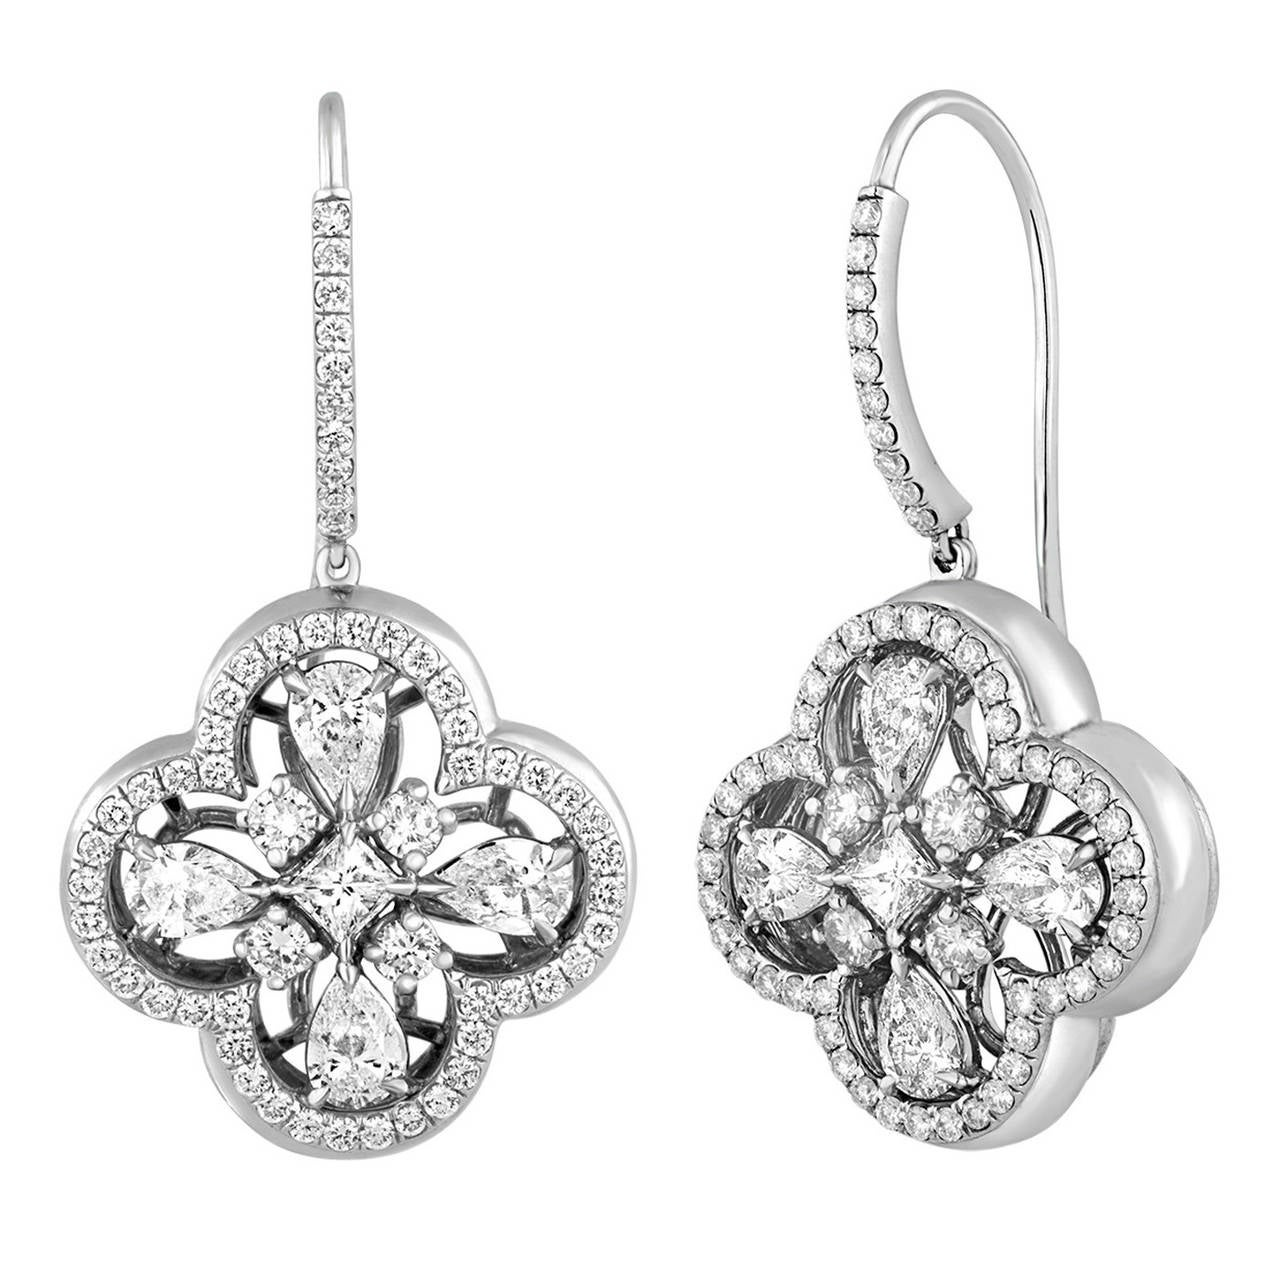 3.15 Carat Diamond Clover Gold Earrings